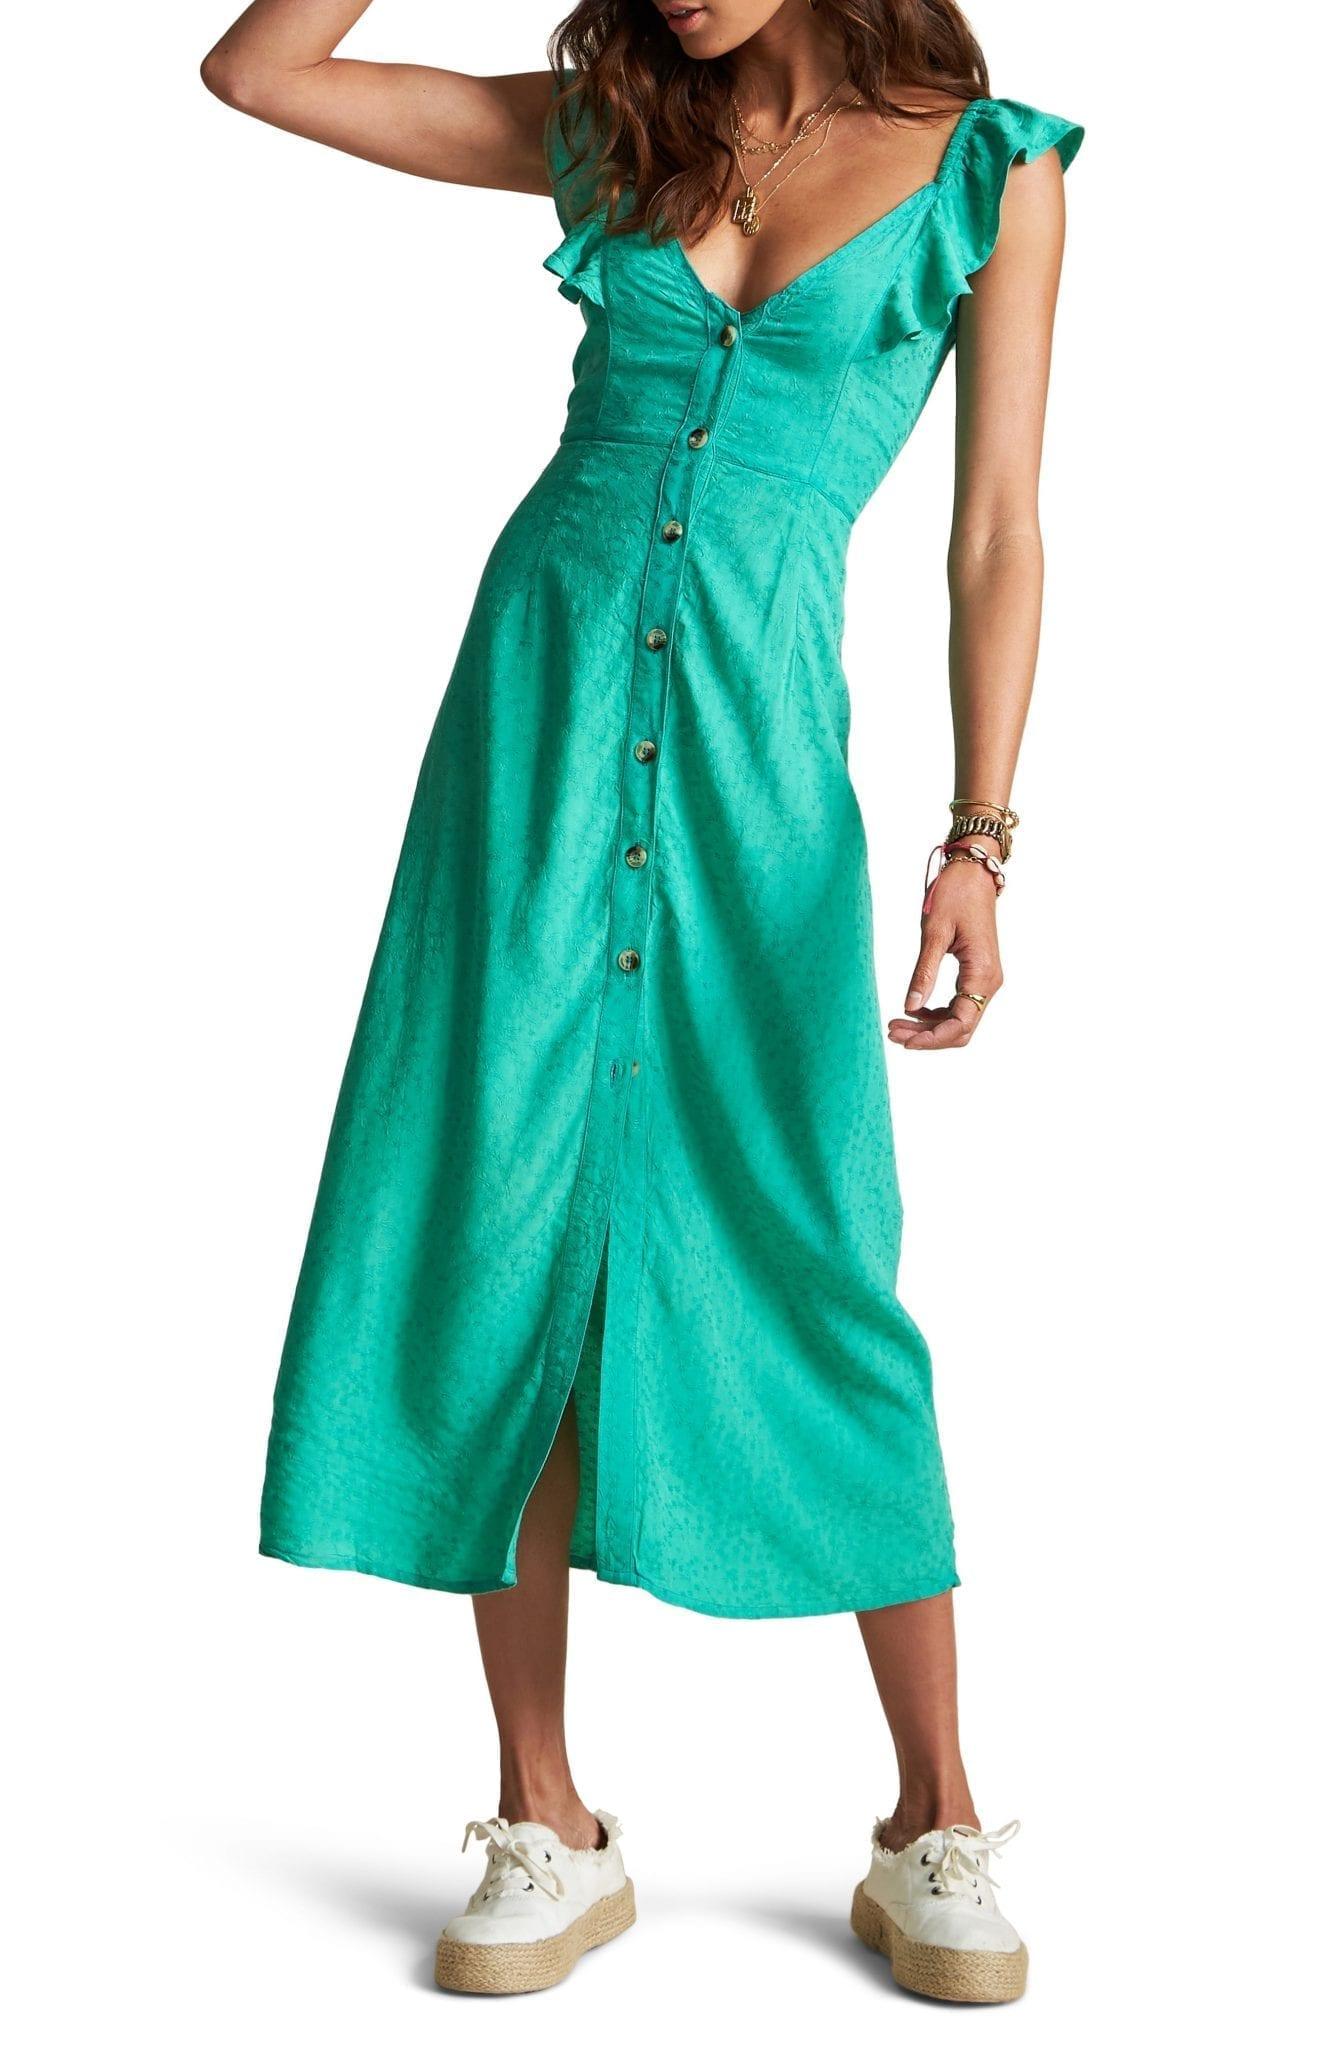 BILLABONG x Sincerely Jules Love Tripper Embroidered Dress